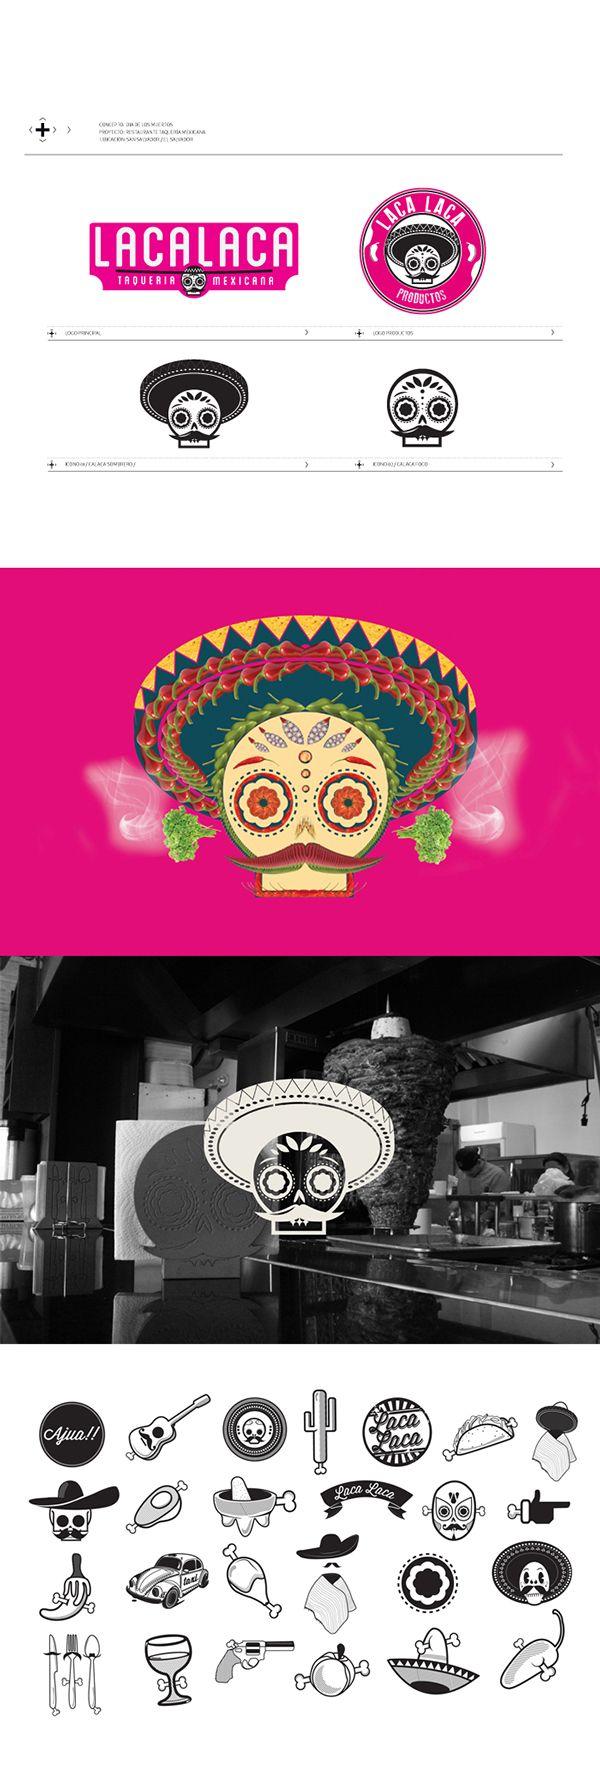 LACALACA - TAQUERÍA MEXICANA on Branding Served